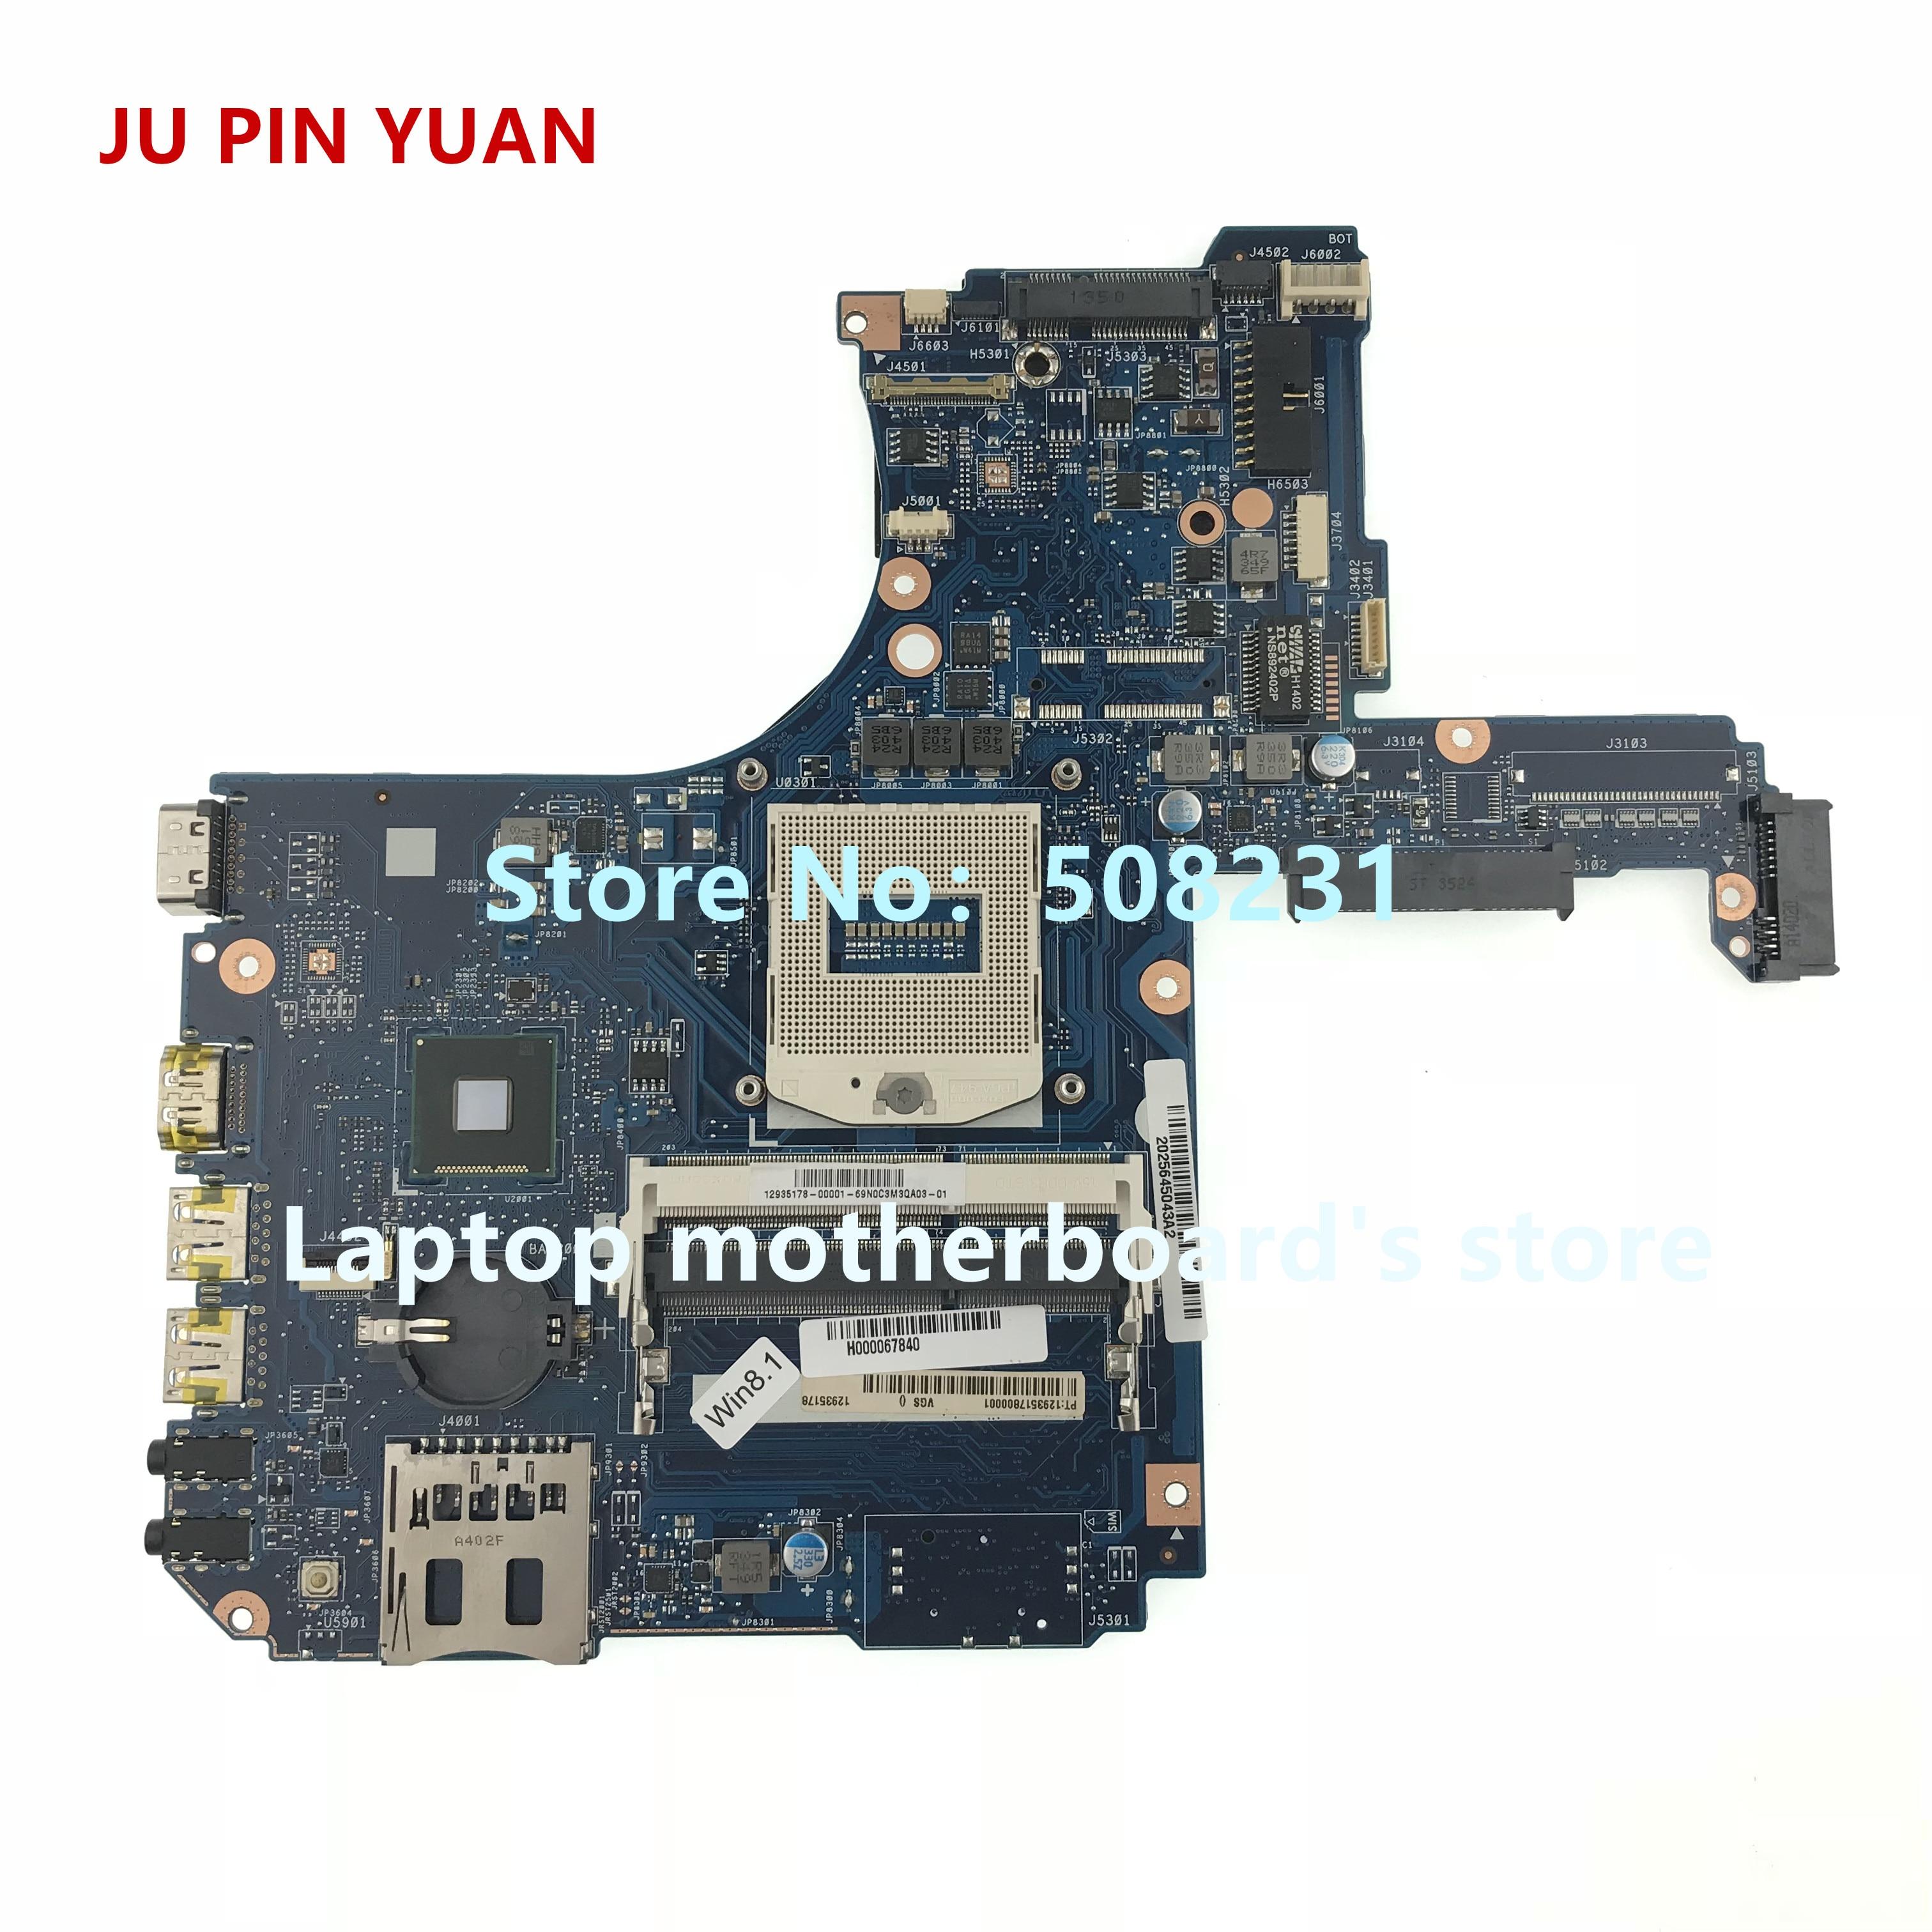 JU PIN YUAN For Toshiba Satellite L50-A L55-A Laptop Motherboard H000067840 Mainboard Socket PGA 947 HM86 DDR3L